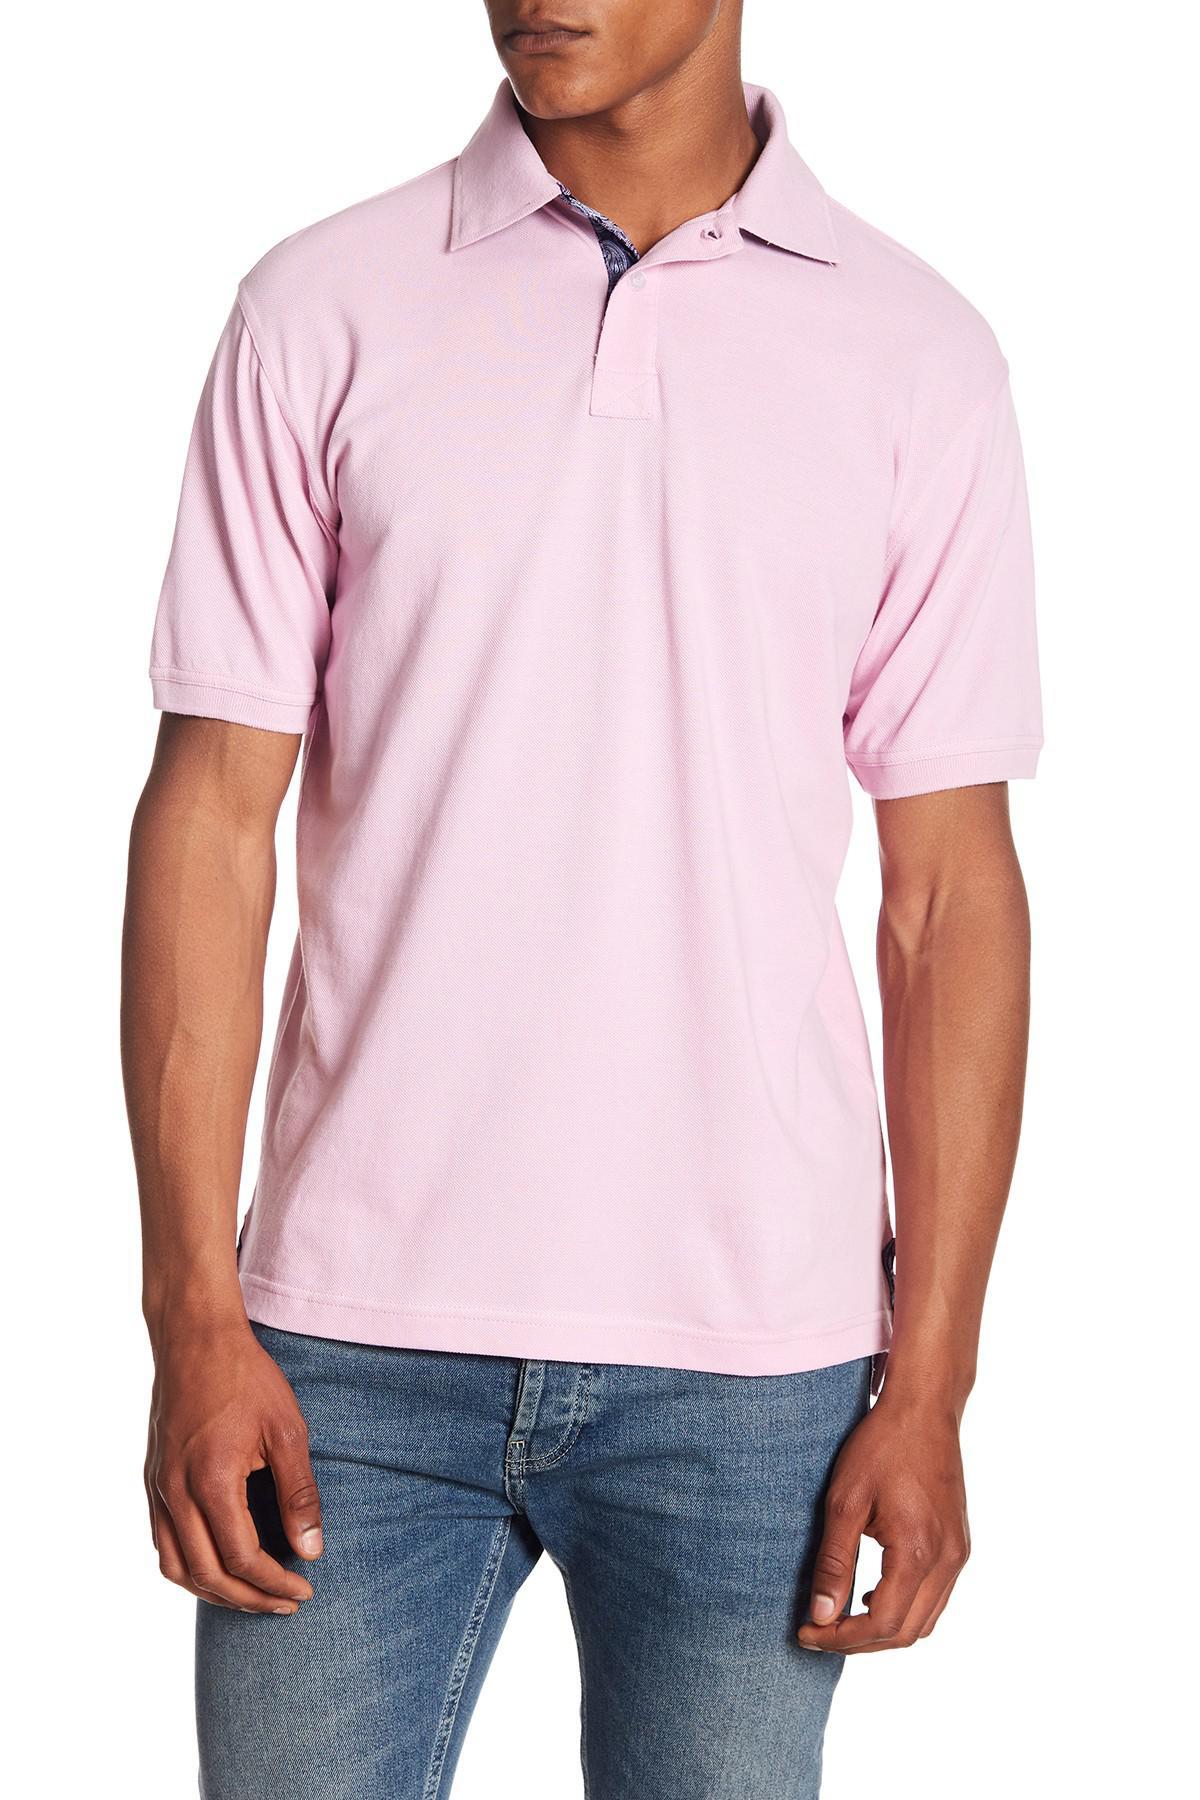 e1d3b9ca4 Printed Polo Shirts Bristol | RLDM